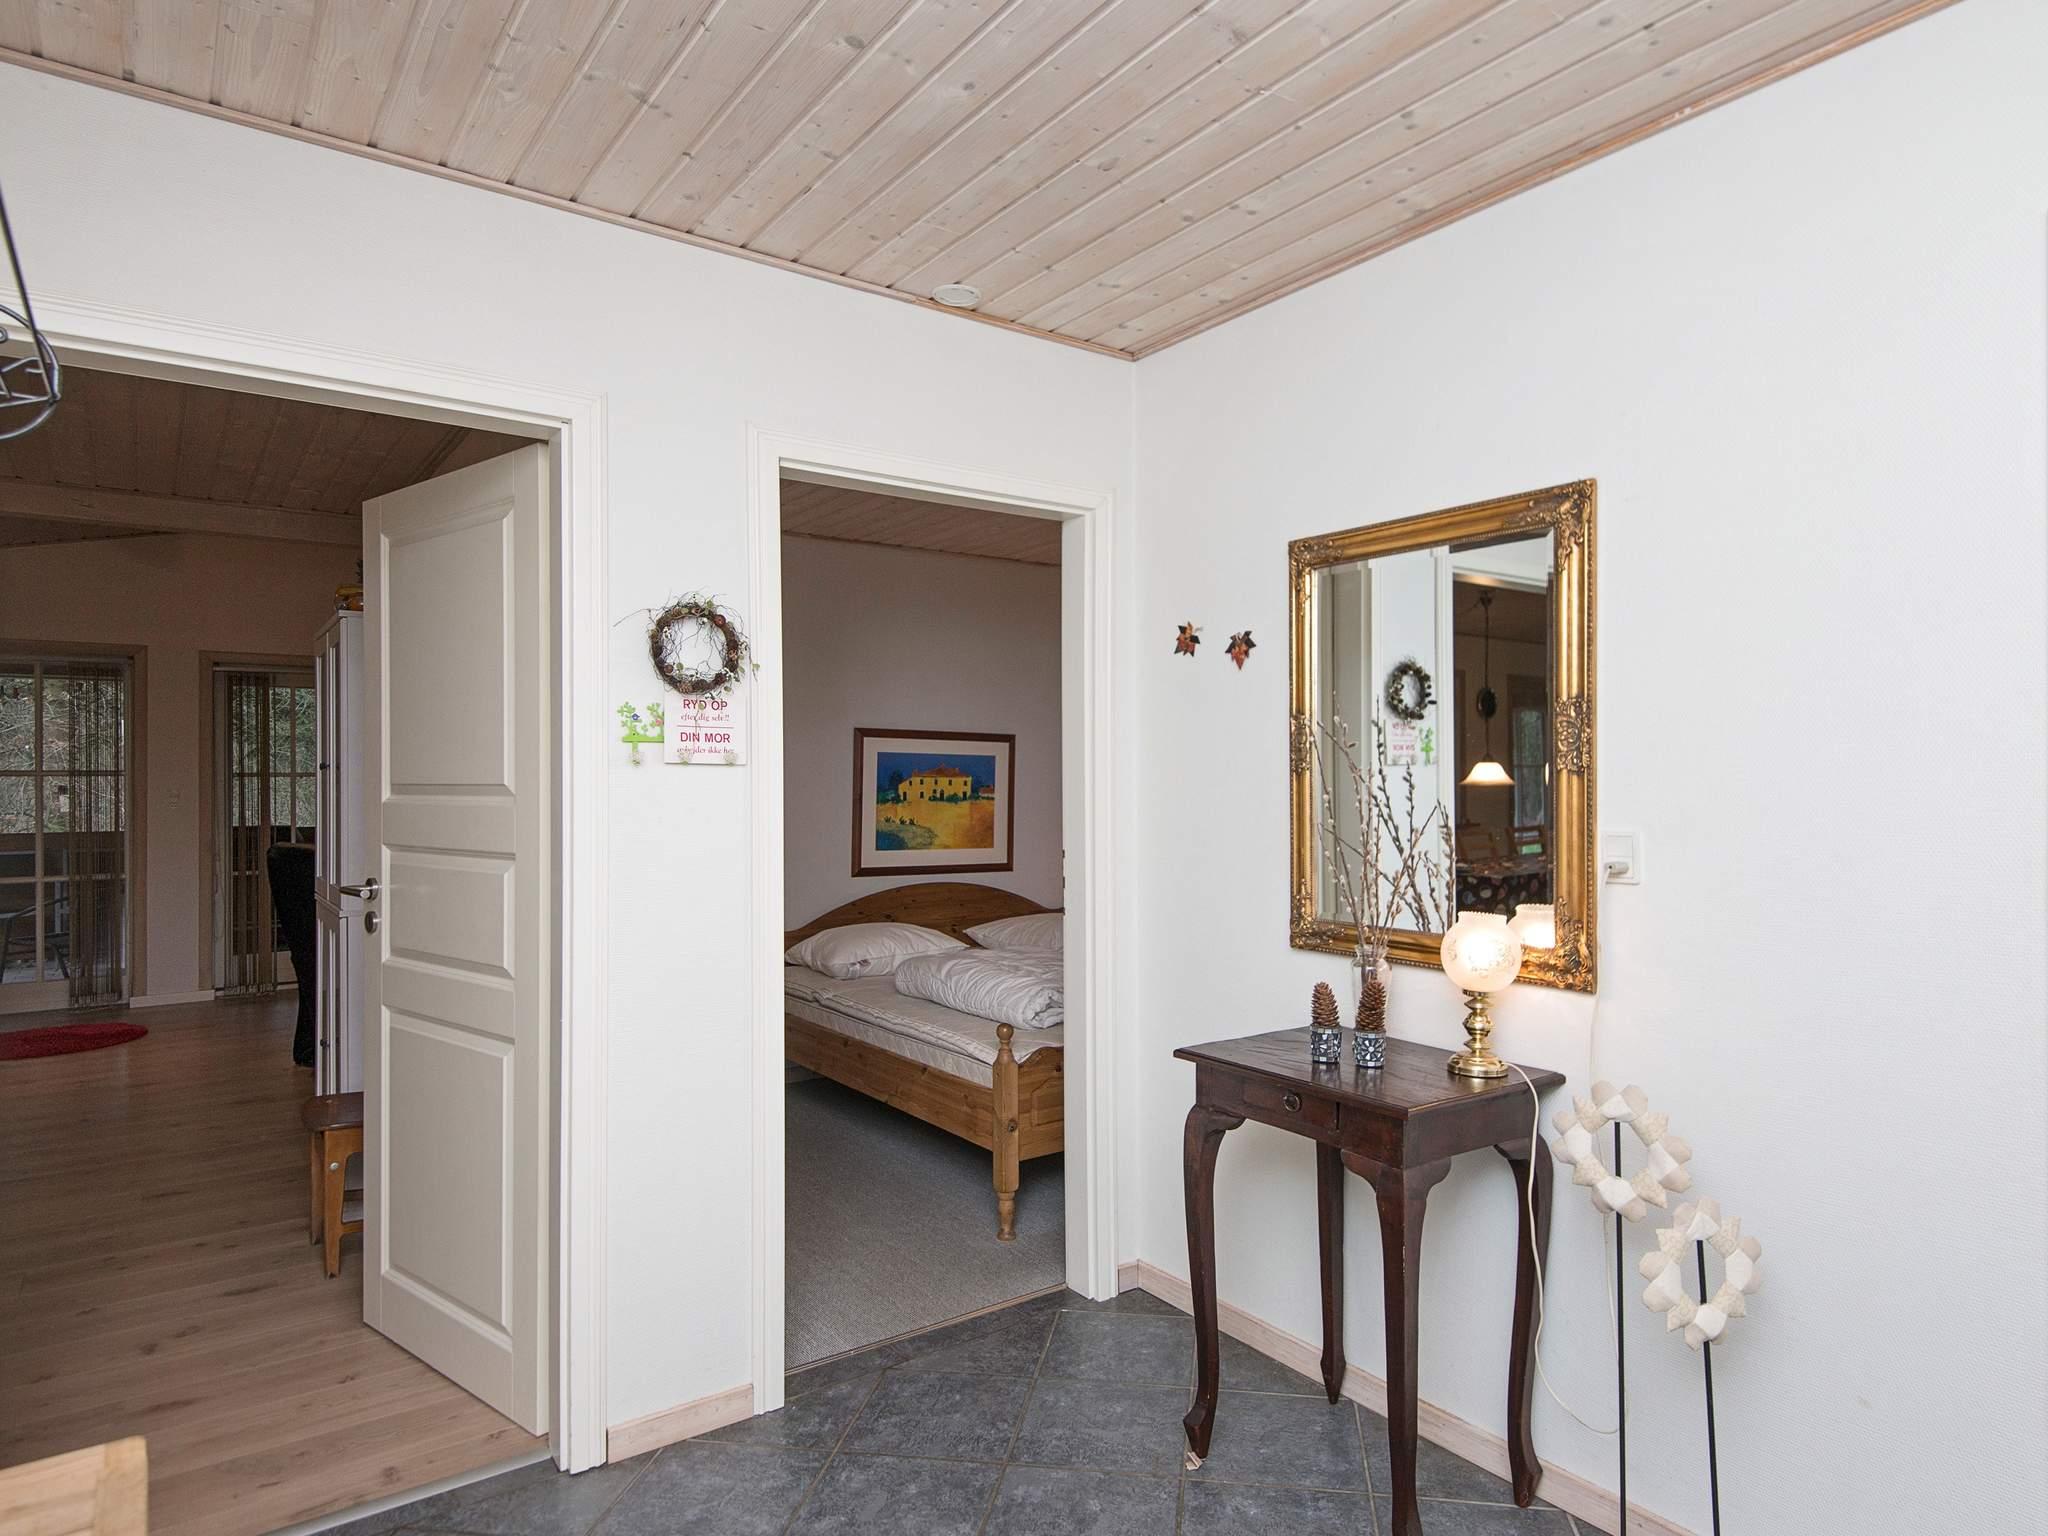 Ferienhaus Arrild (730074), Arrild, , Südwestjütland, Dänemark, Bild 15